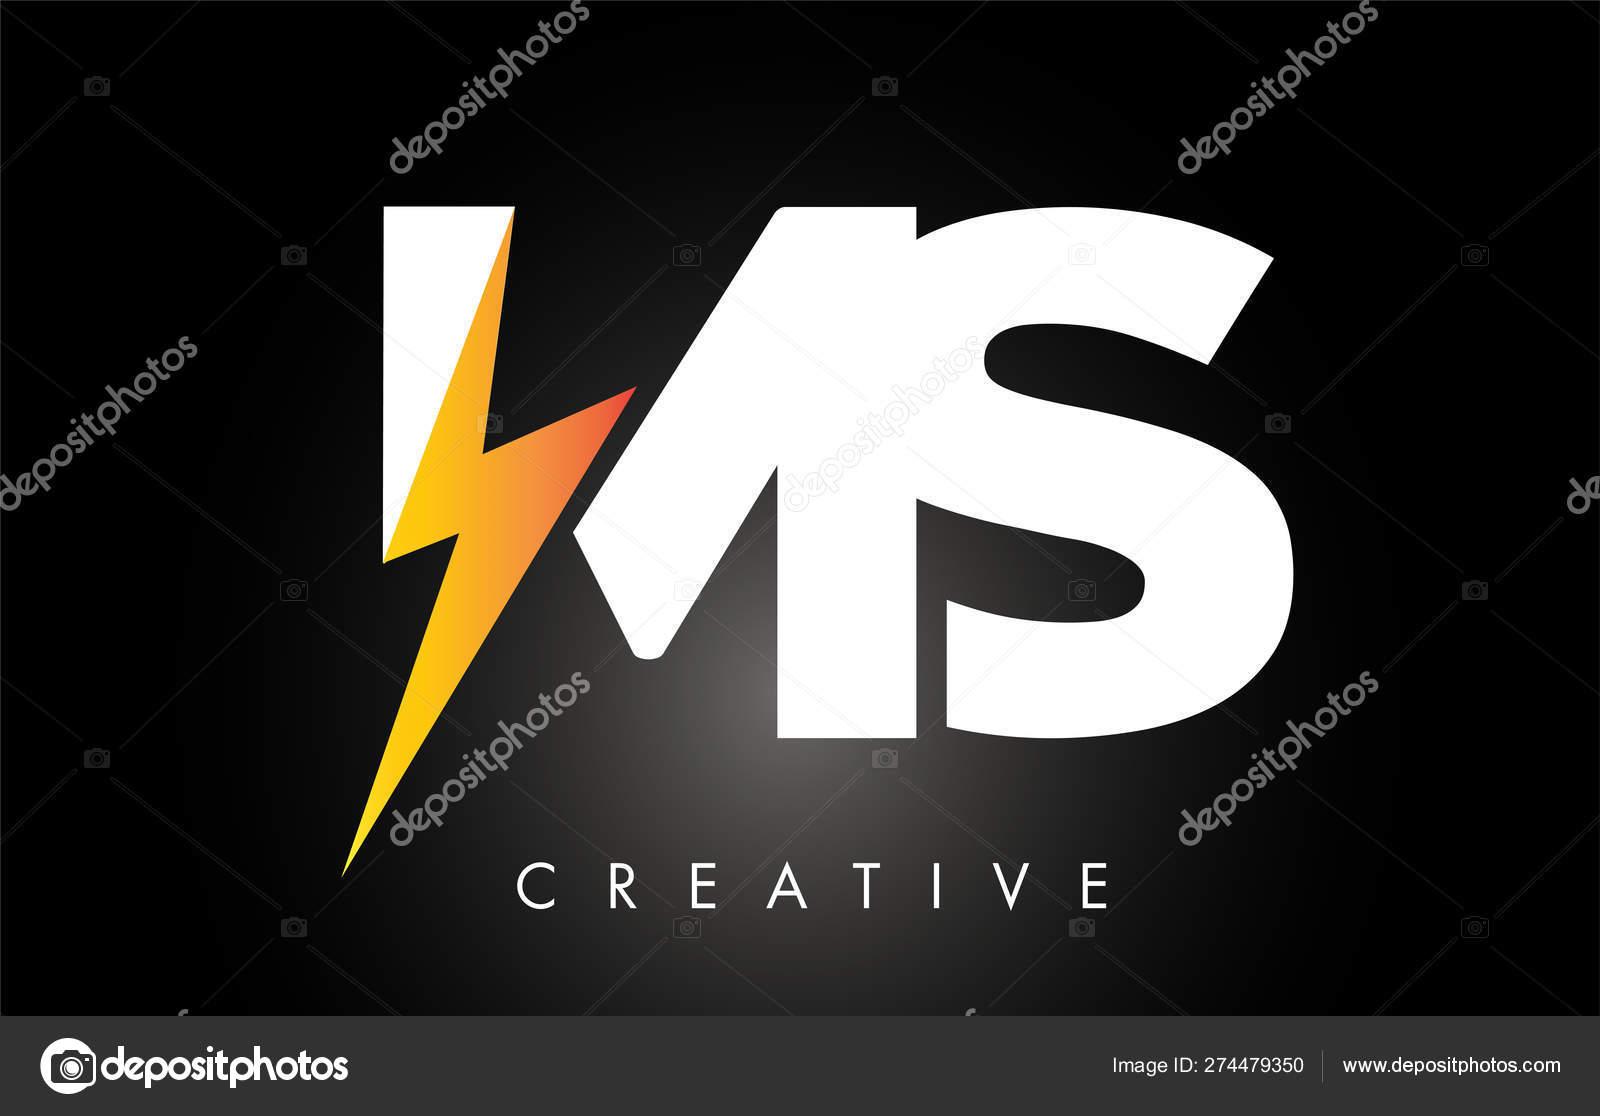 MS Letter Logo Design With Lighting Thunder Bolt  Electric Bolt